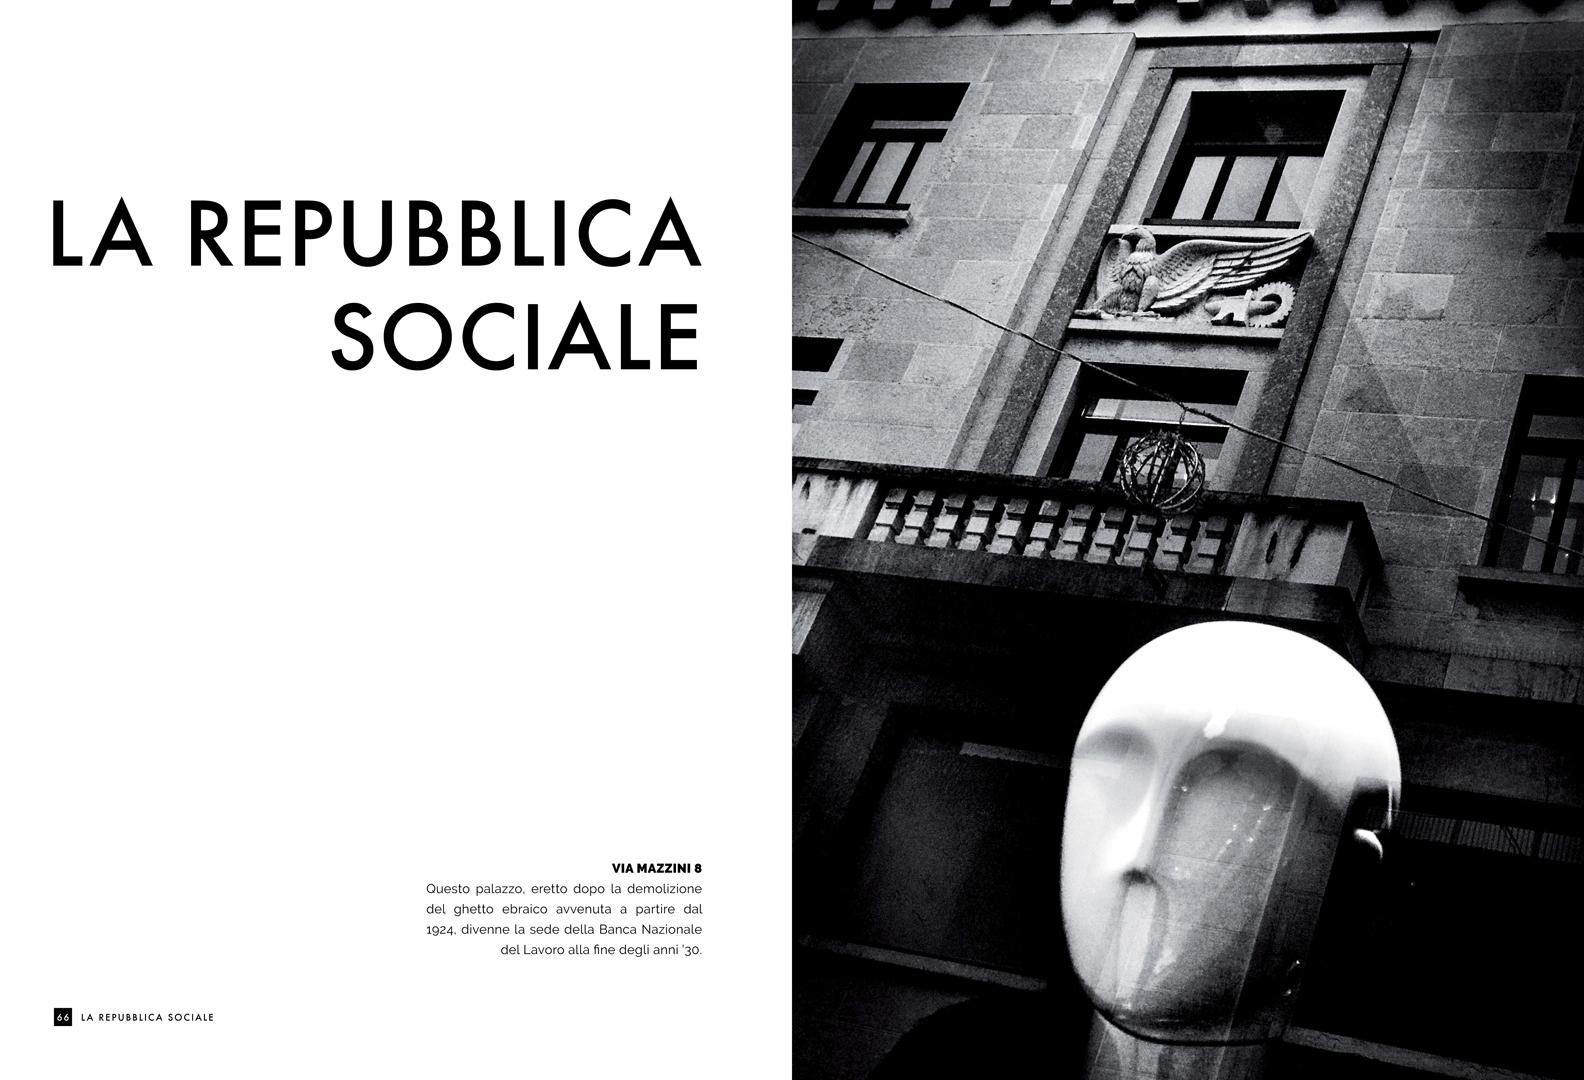 rep-sociale-intro.jpg